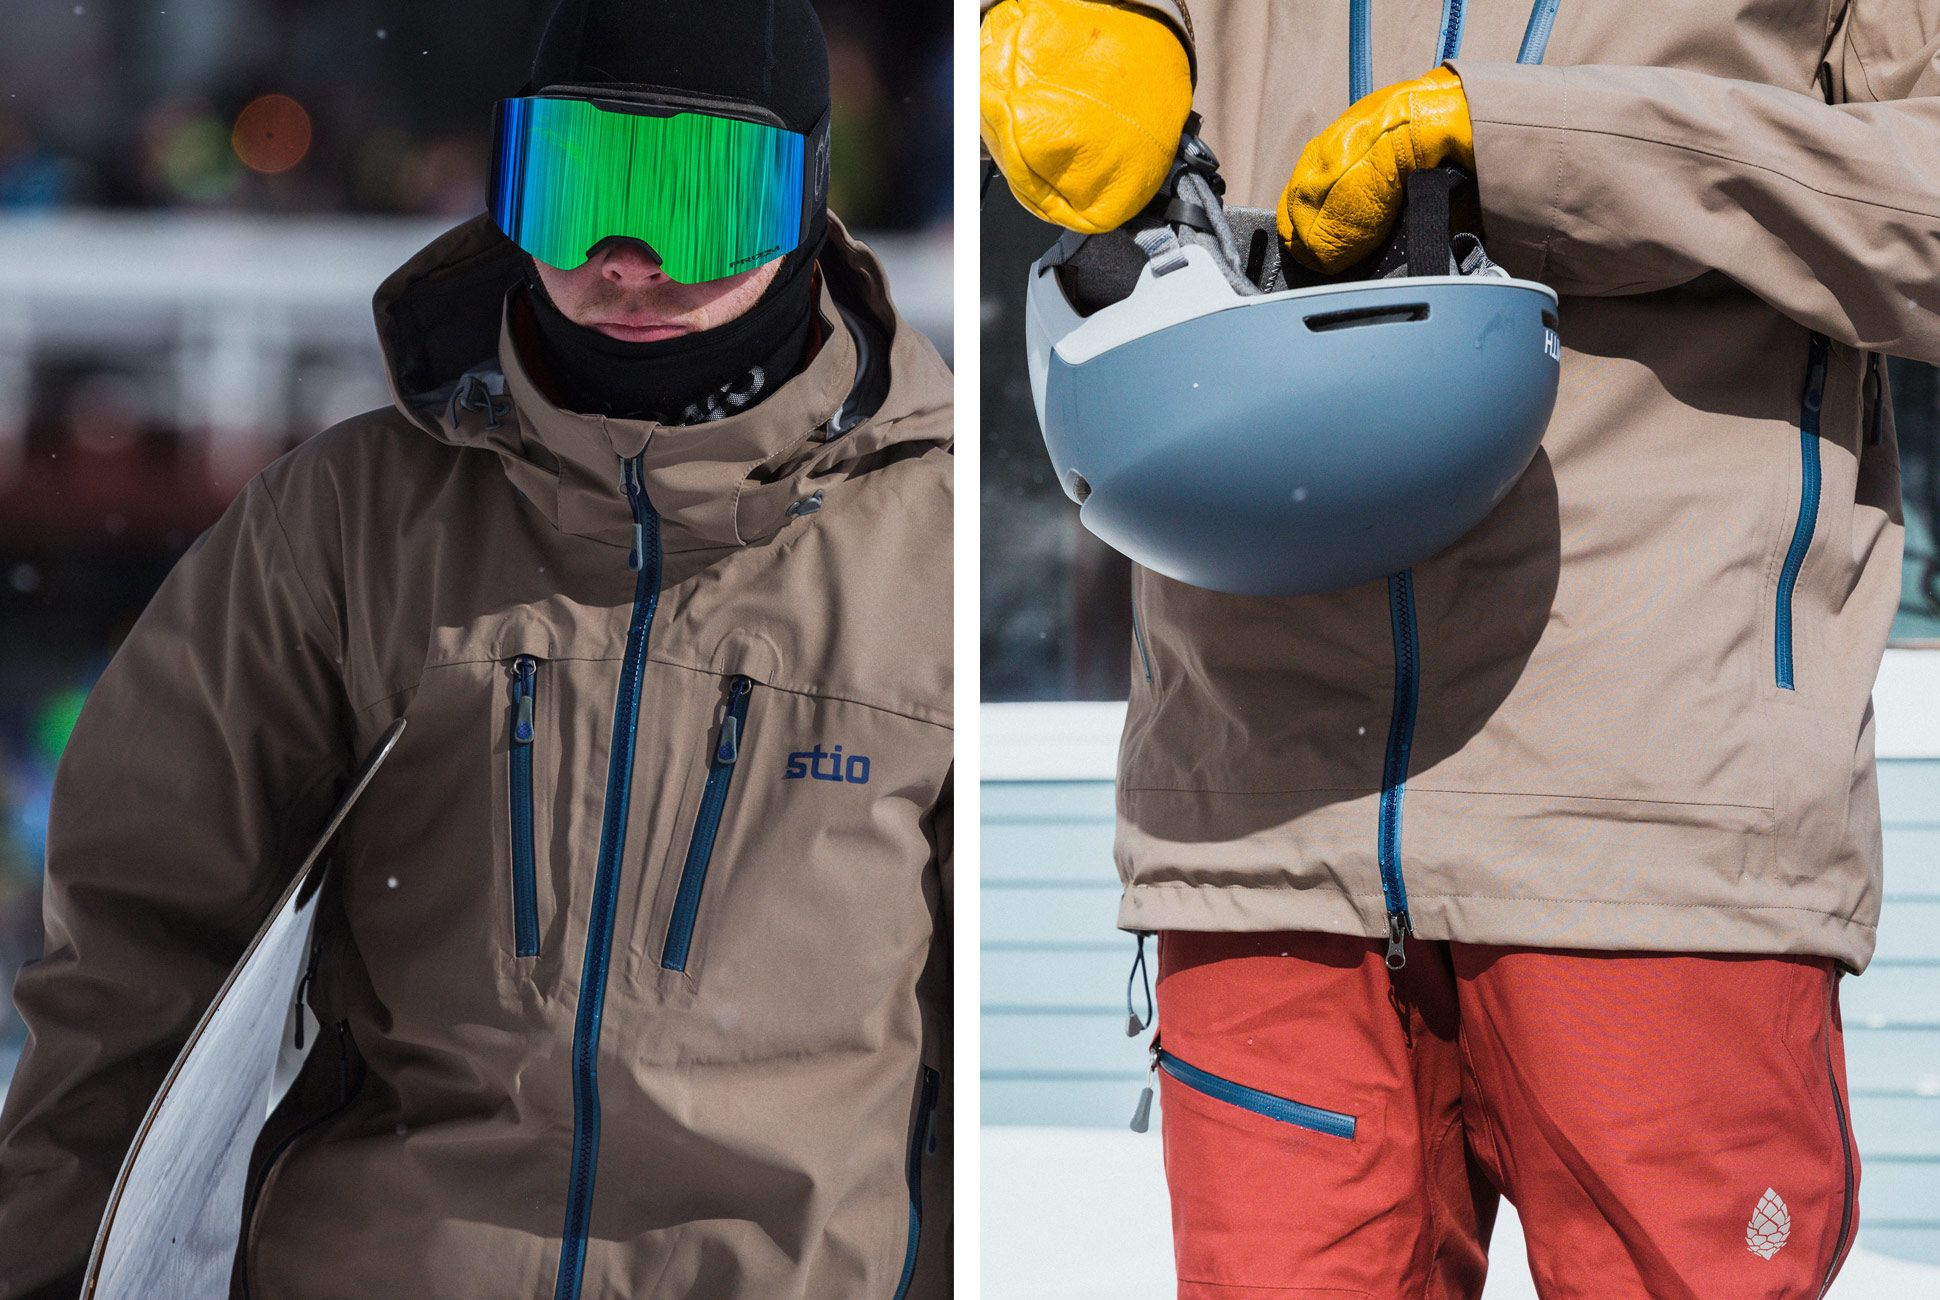 ultimate-ski-and-snow-gear-patrol-stio-slide-3